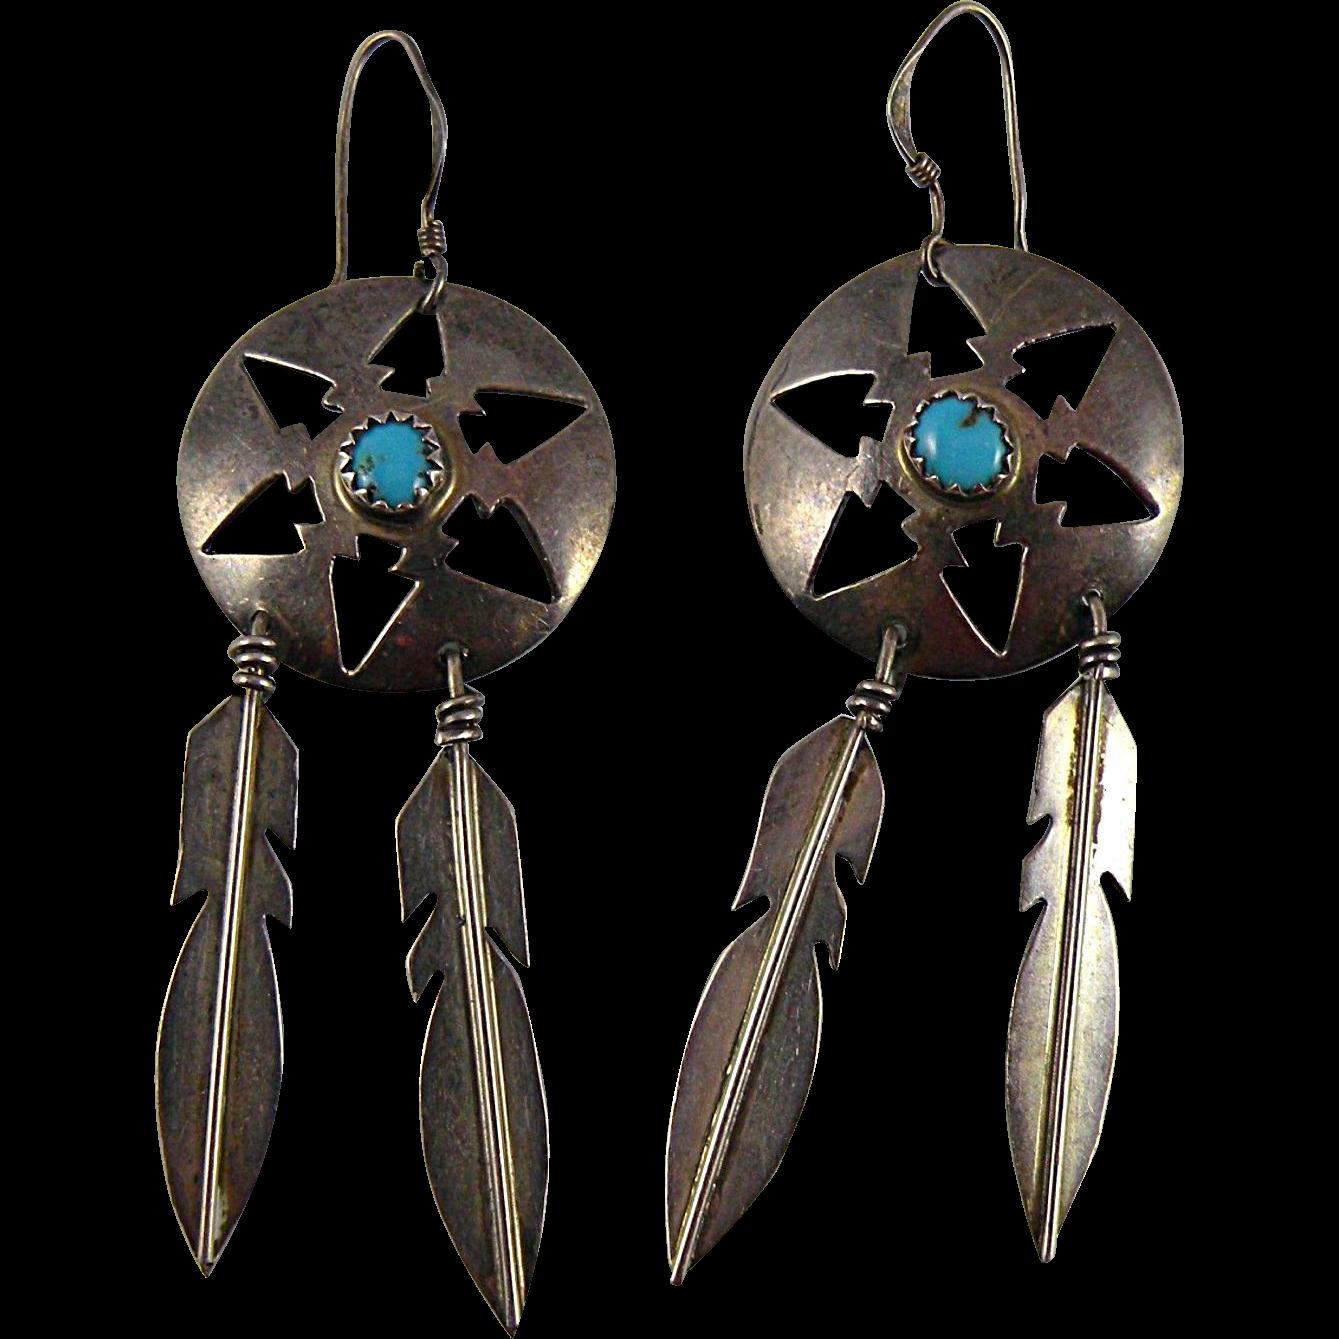 Donovan Skeets Navajo Sterling Silver Earrings with Turquoise